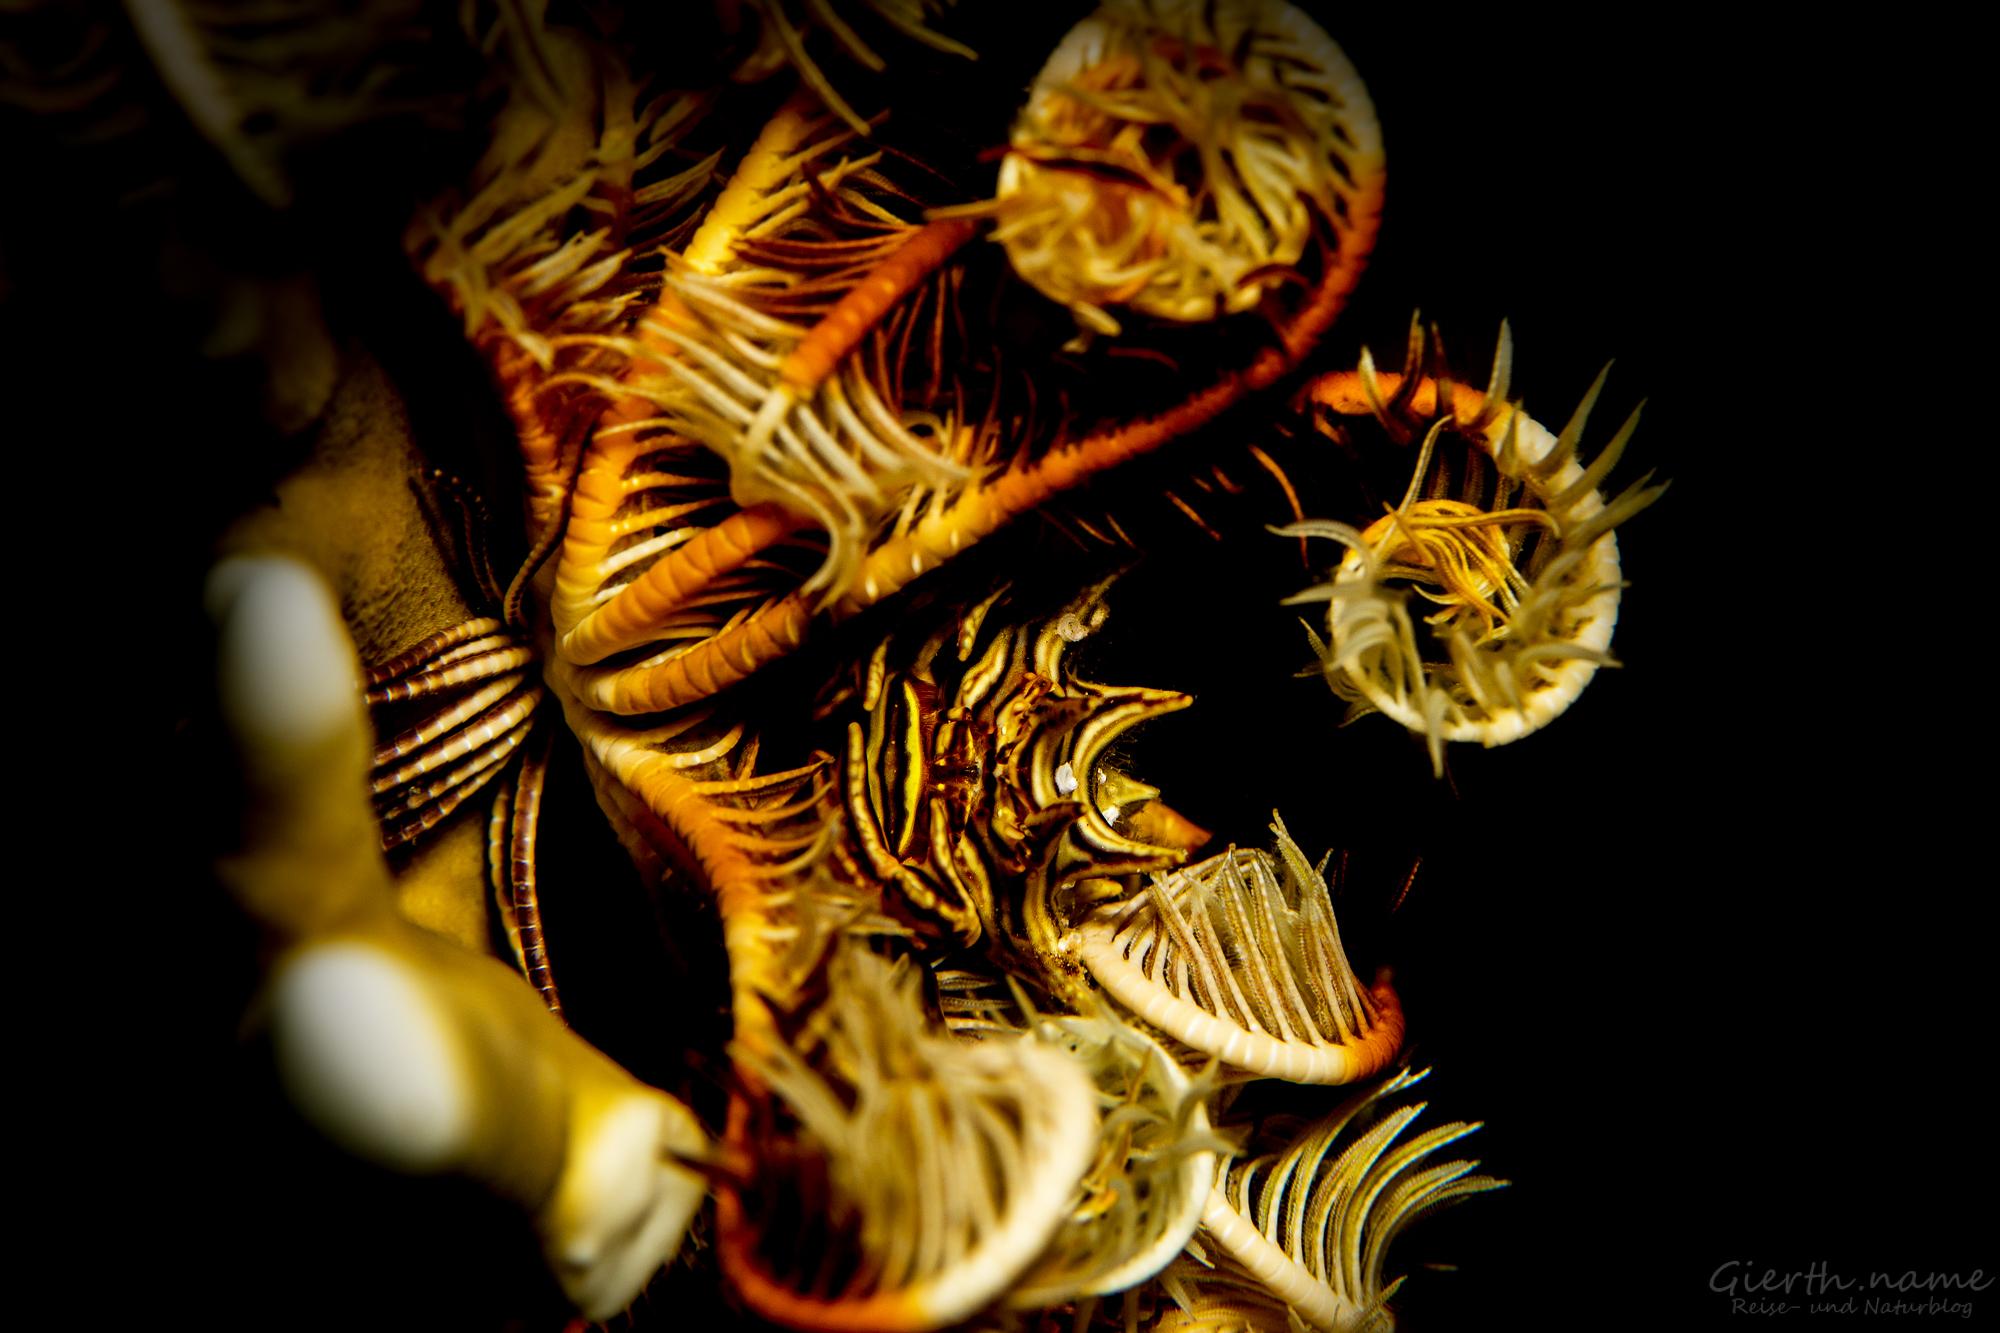 Federstern-Krabbe in ihrem Federstern